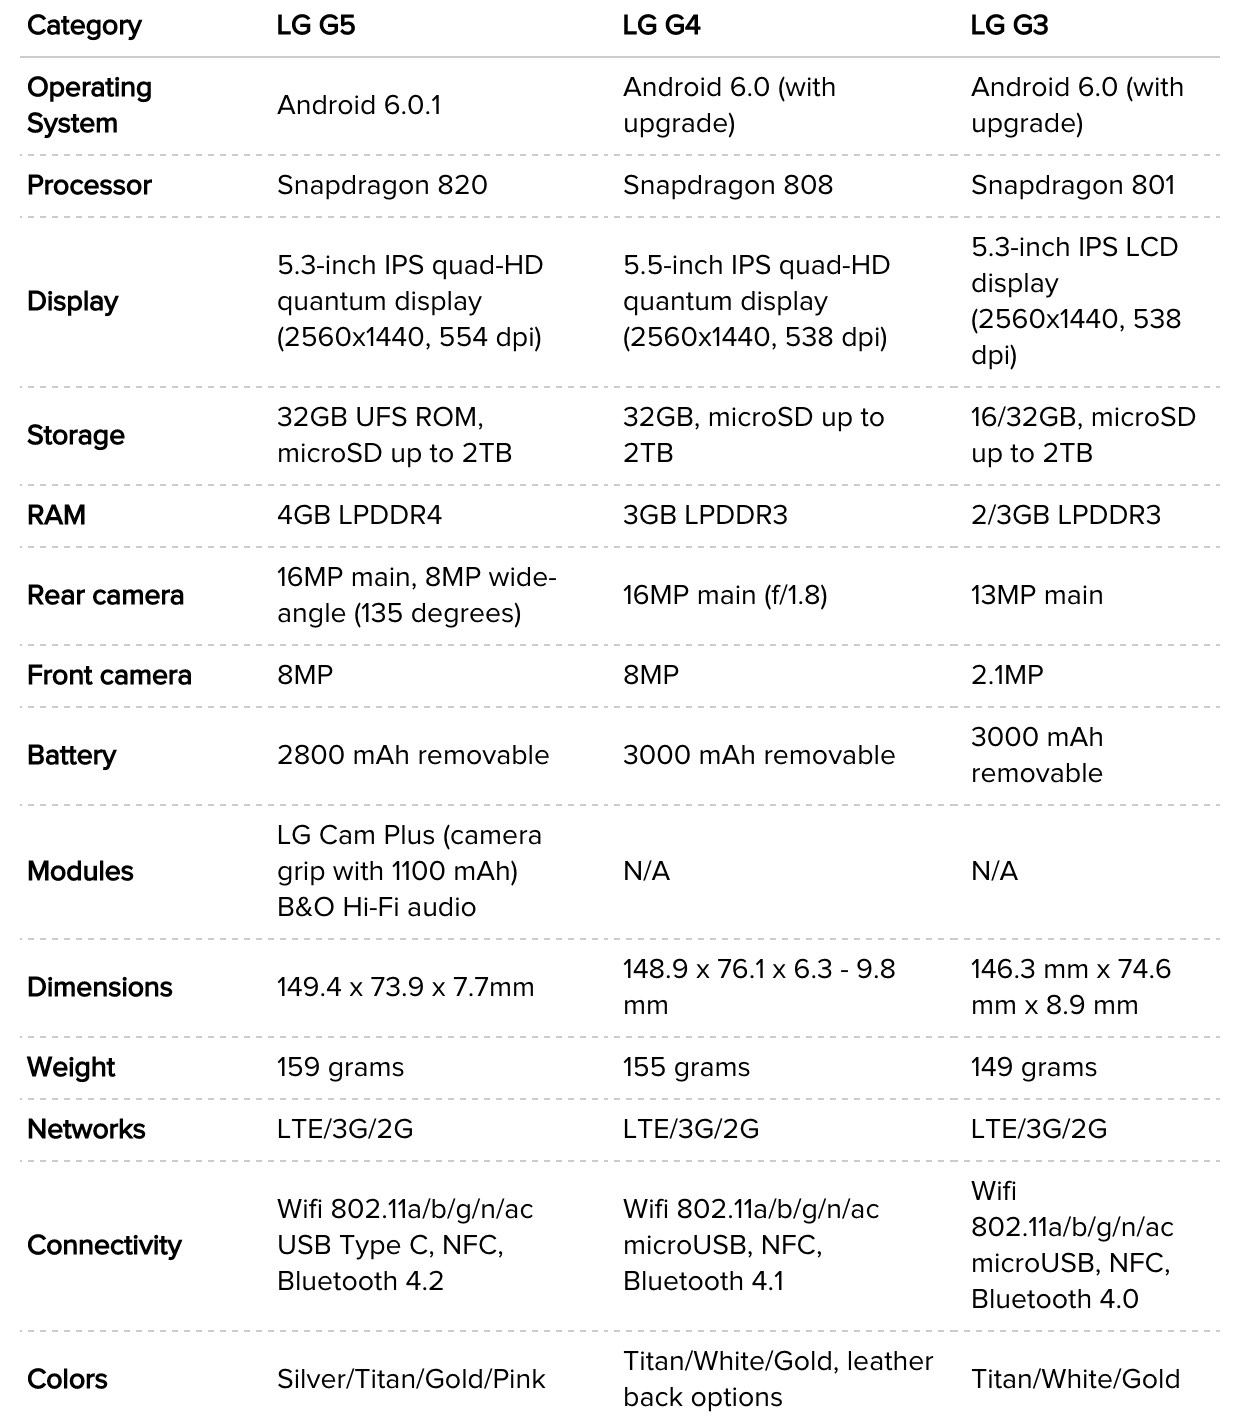 LG G5 vs LG G4 vs LG G3